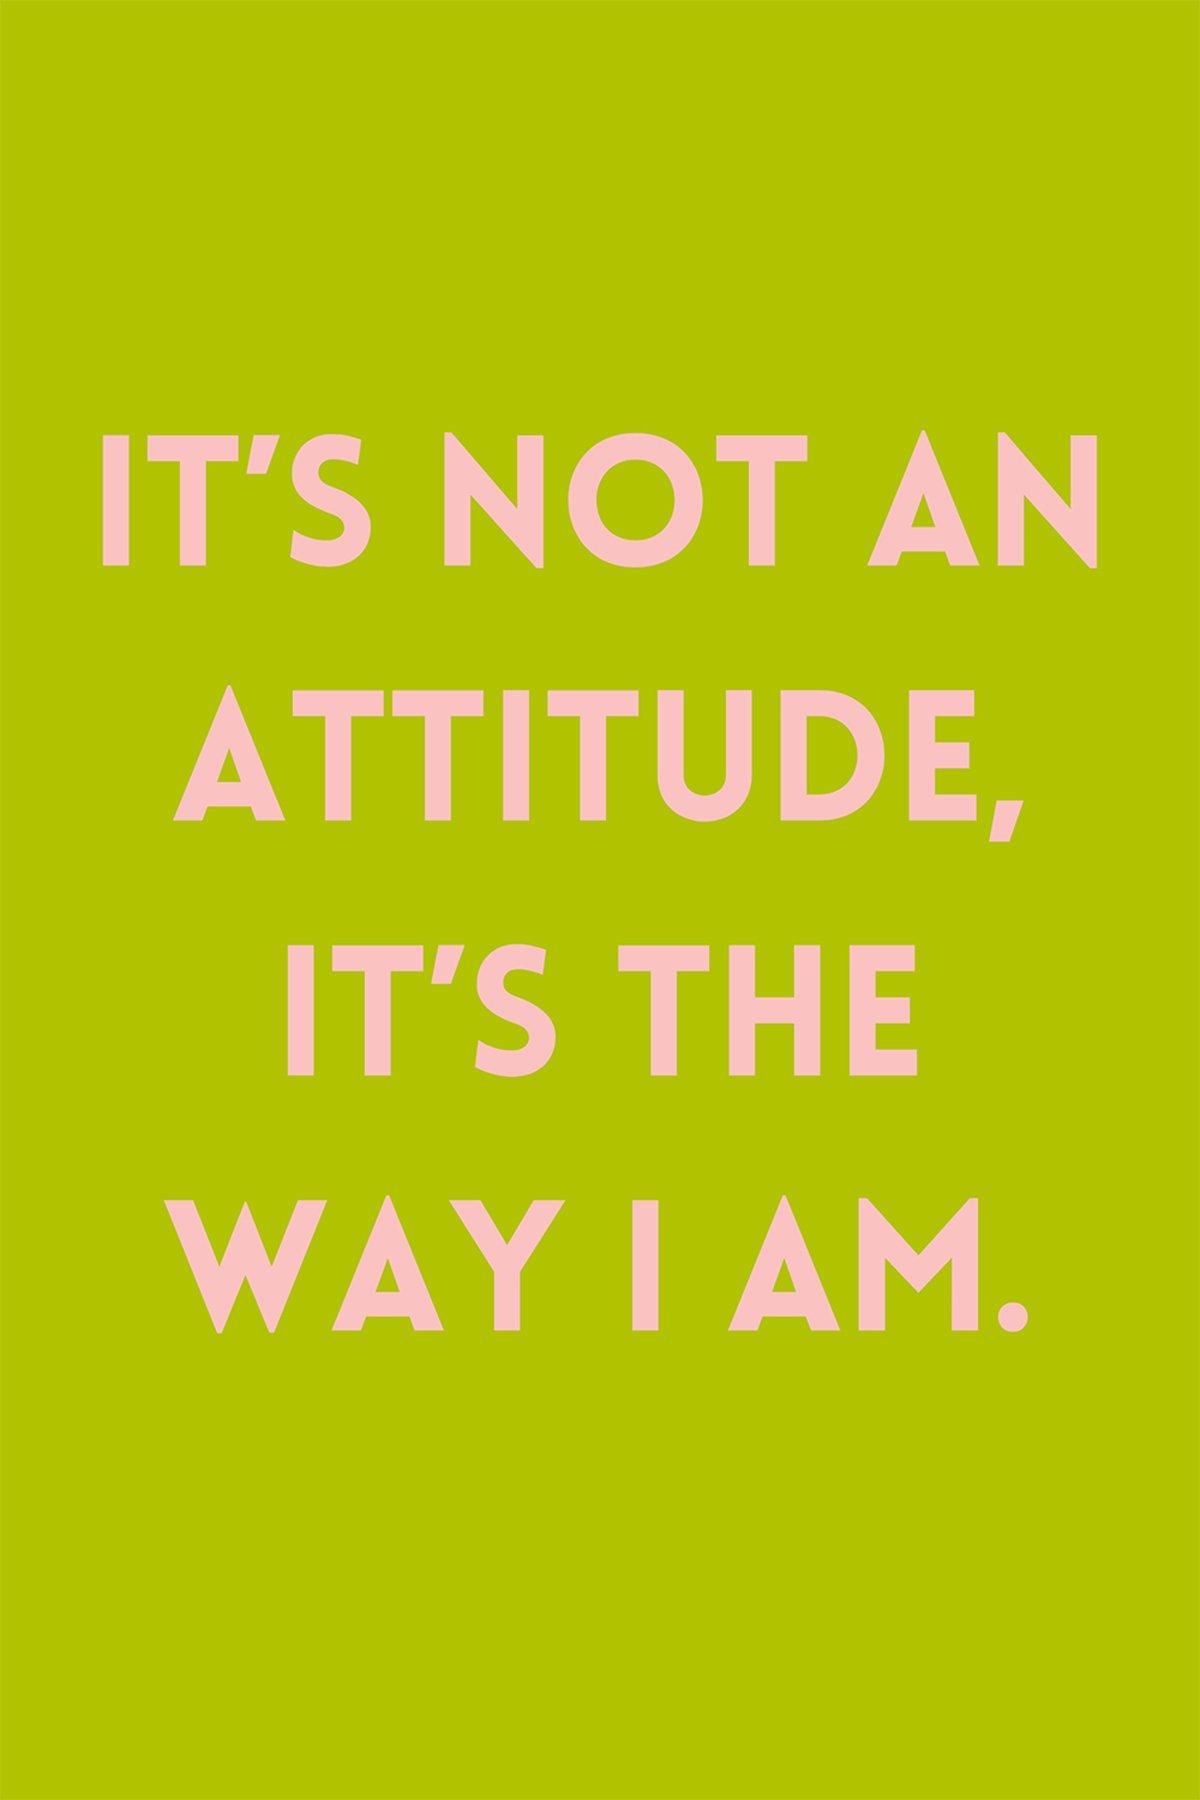 Girl Attitude Sayings